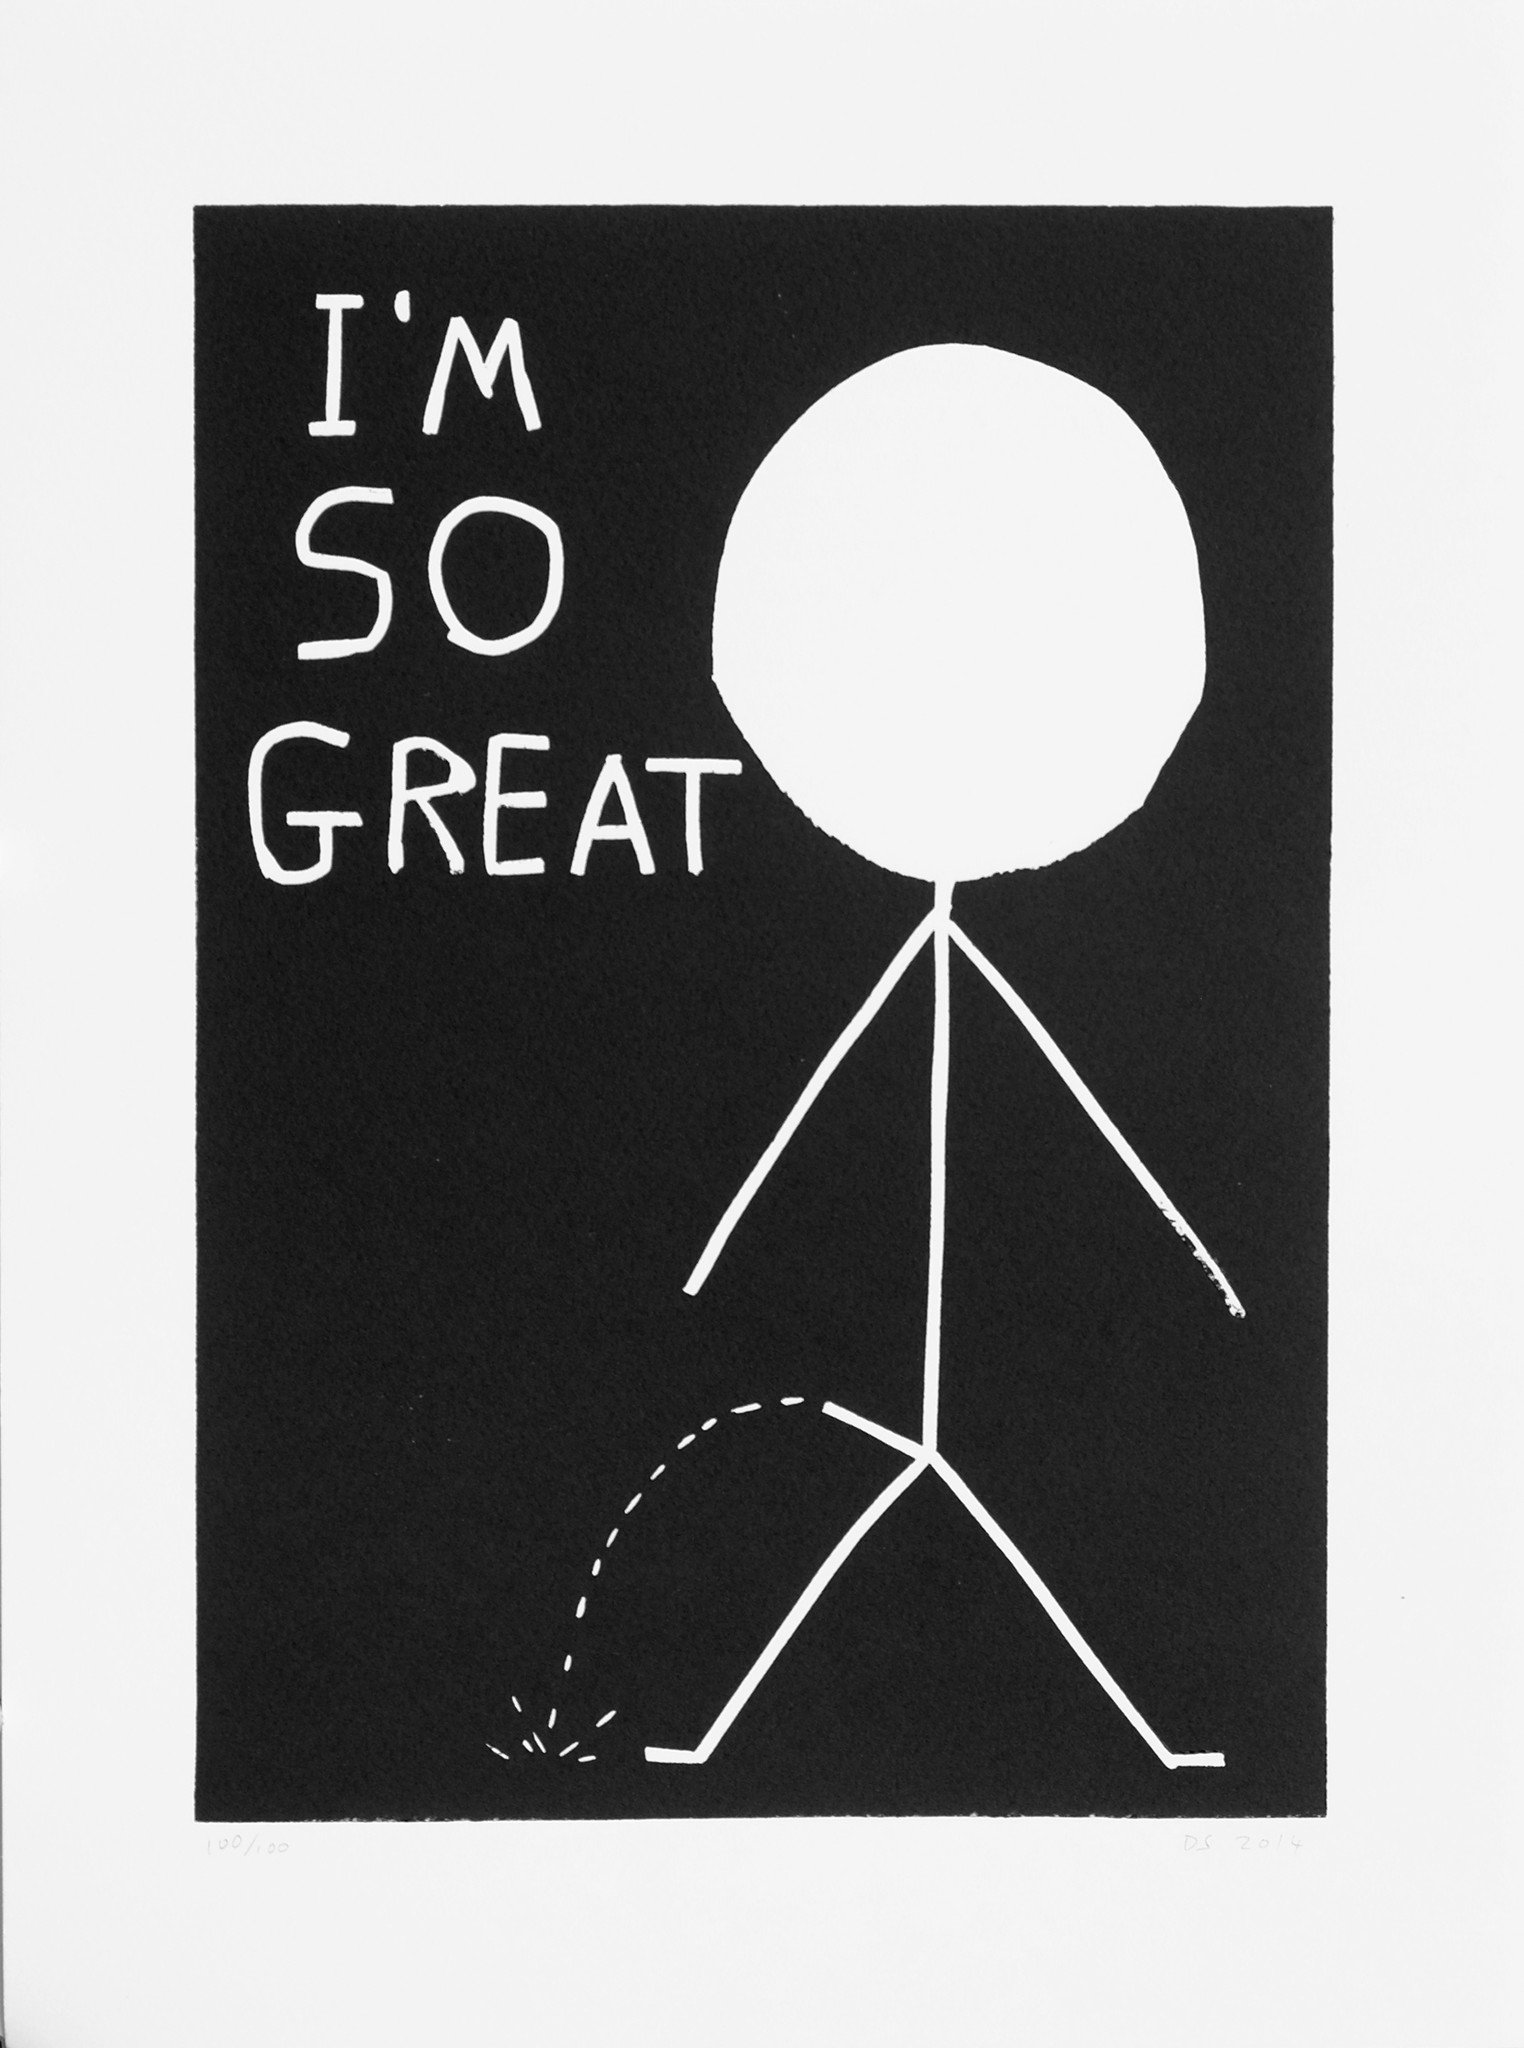 I Am So Great by David Shrigley